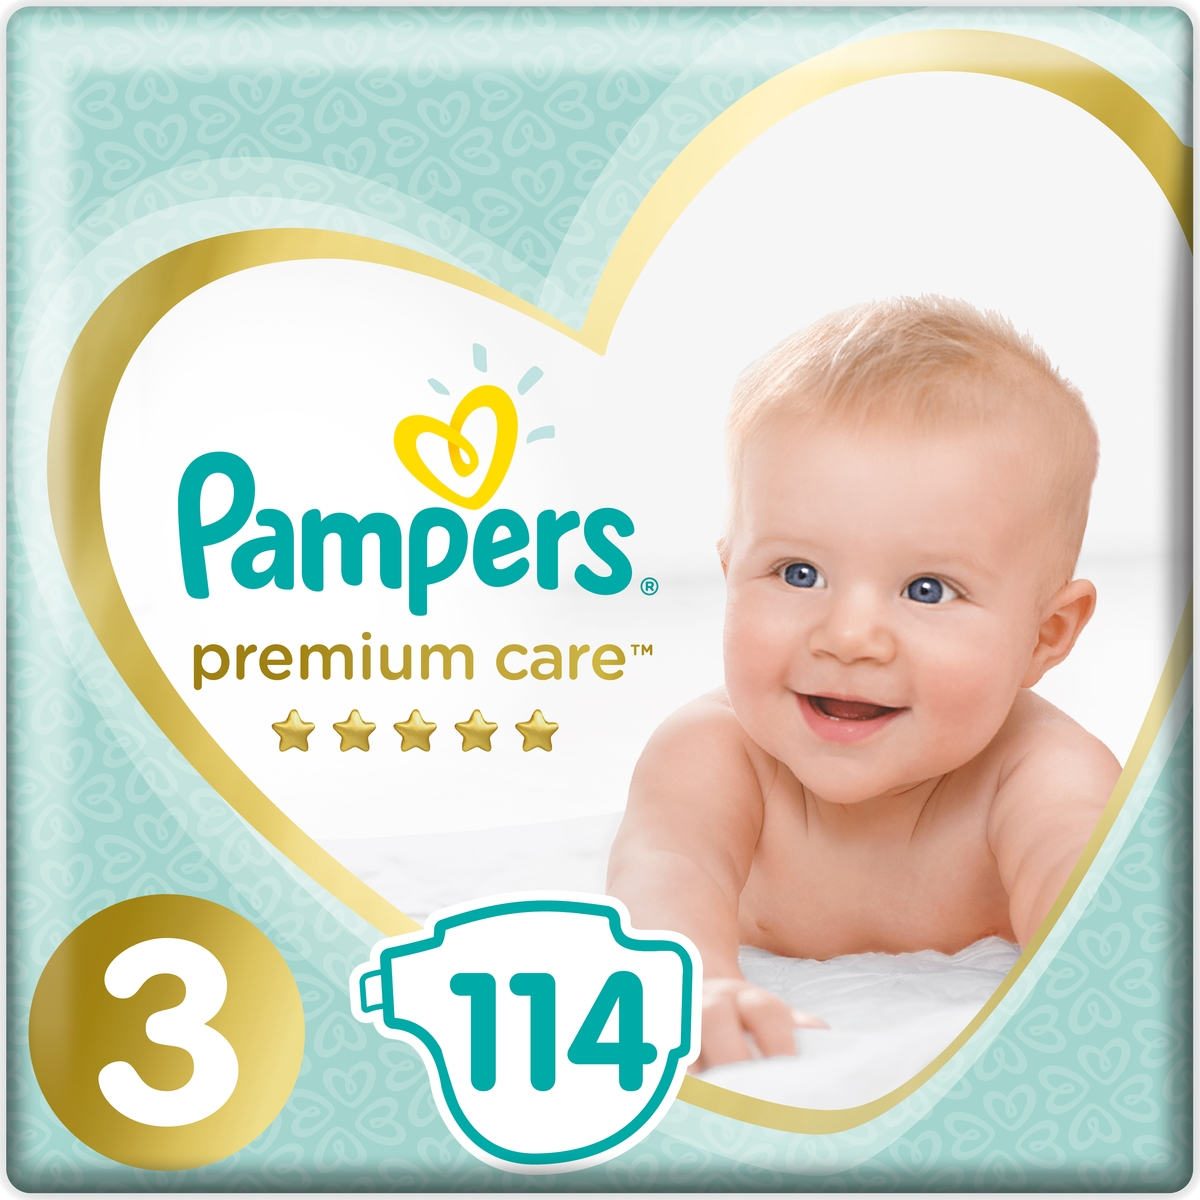 Pampers Подгузники Premium Care 6-10 кг (размер 3) 114 шт